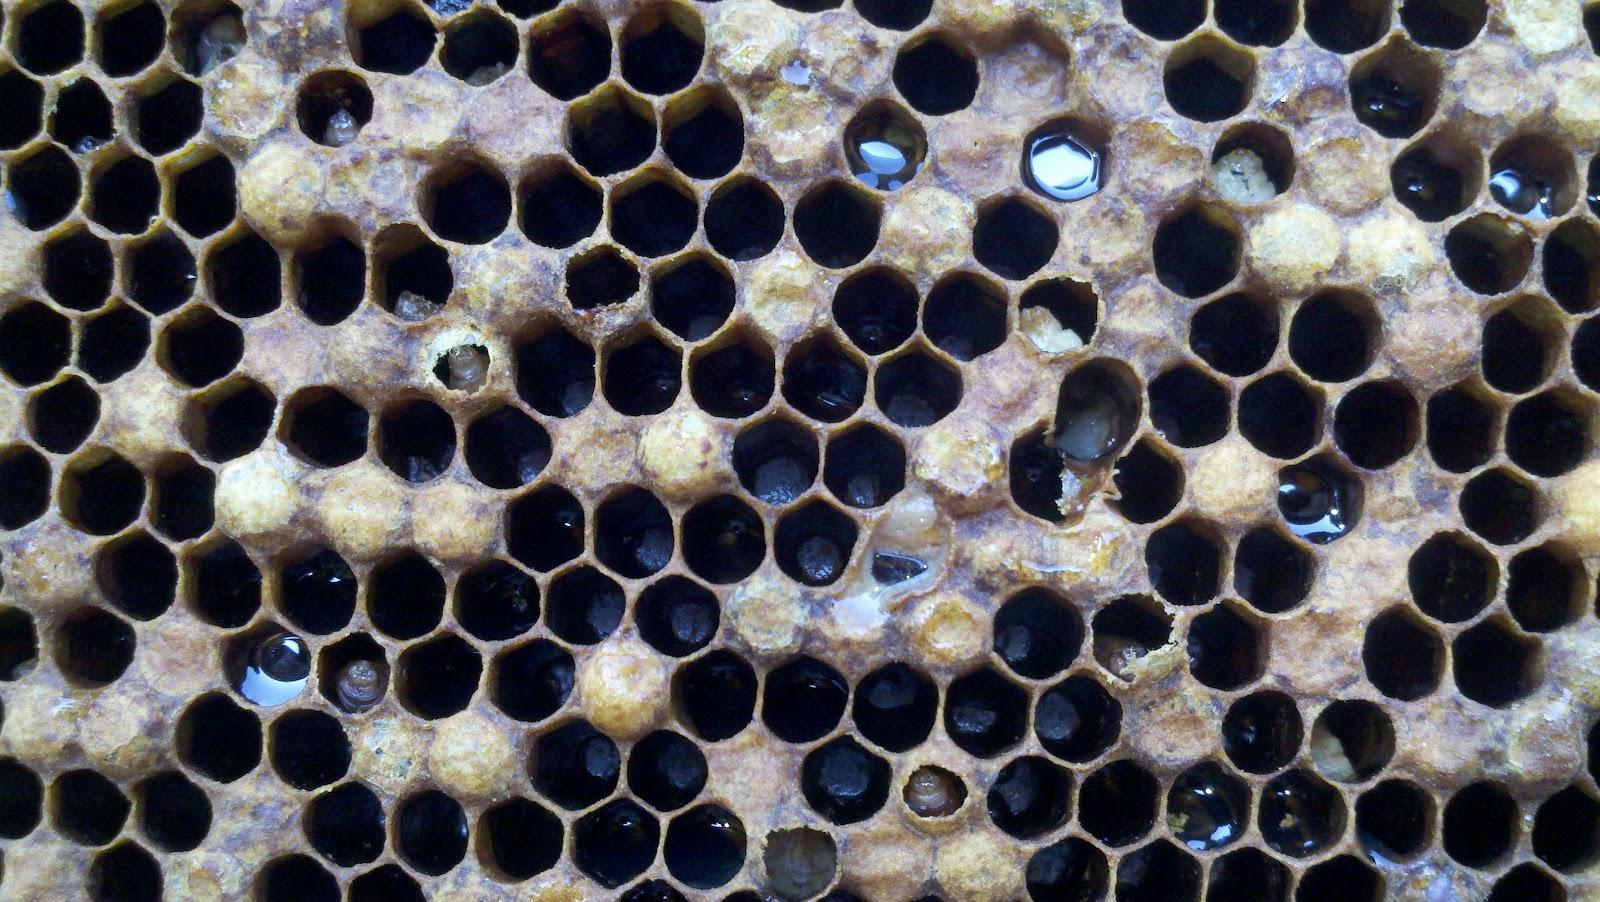 Terramycin Dosage For Bees